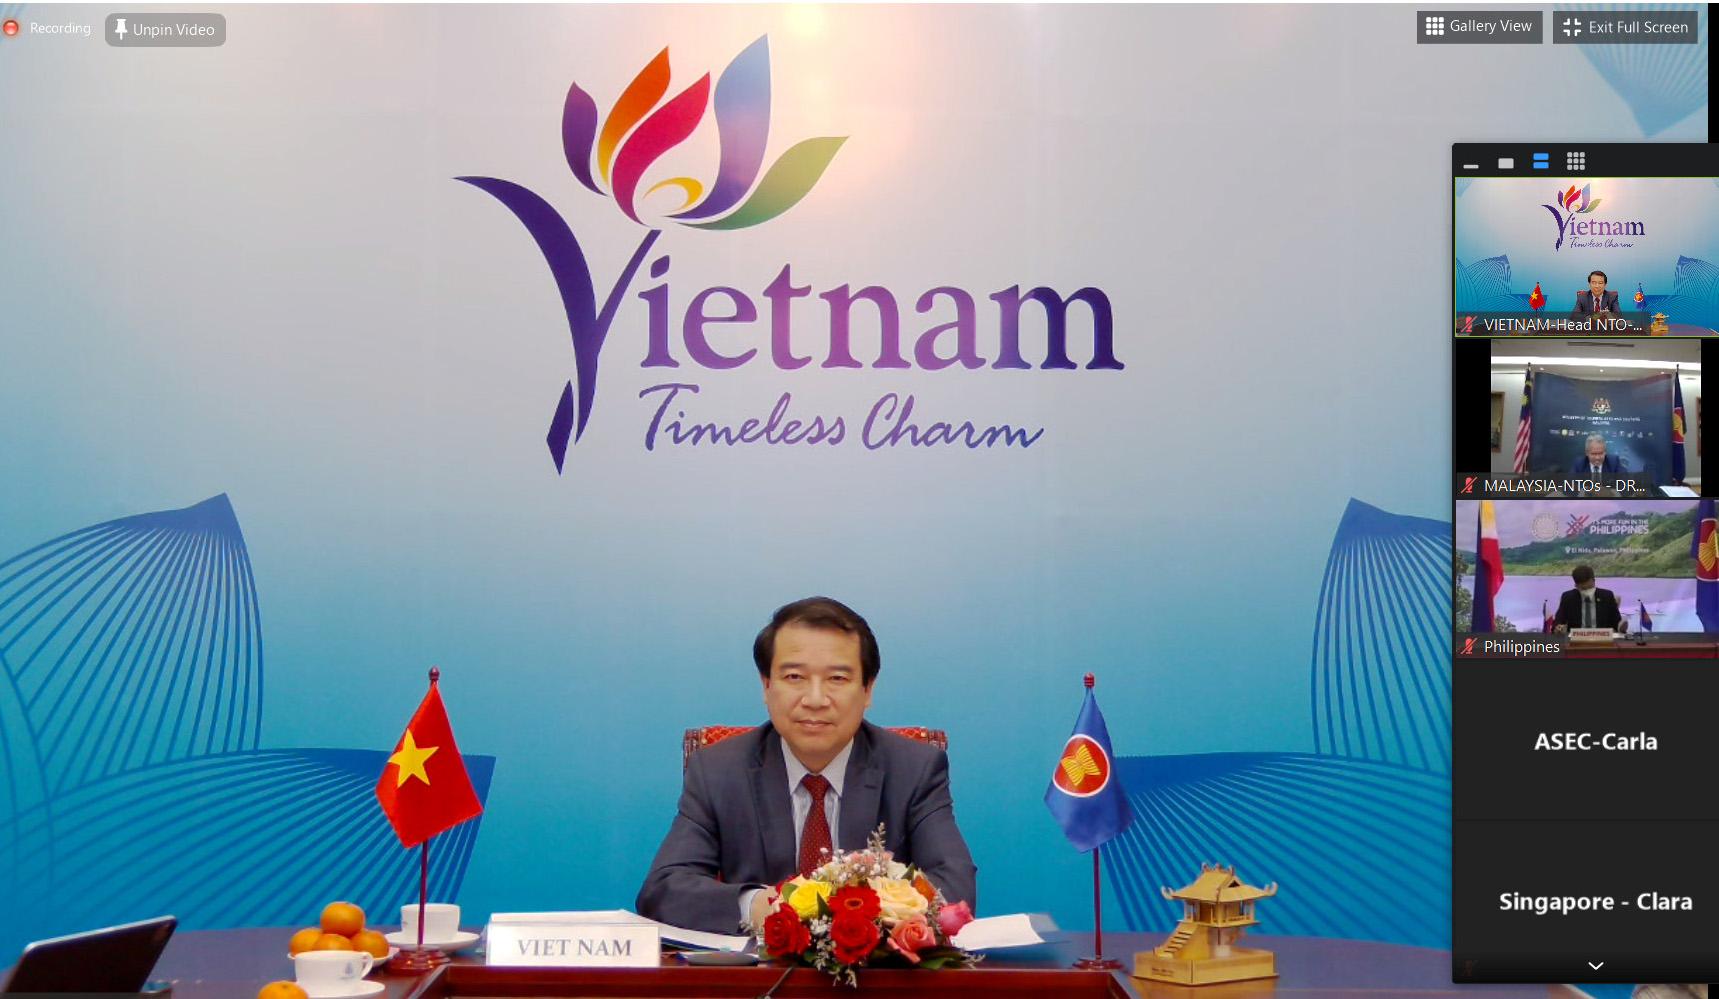 VNAT's Vice Chairman Ha Van Sieu attends 53rd ASEAN NTOs Meeting